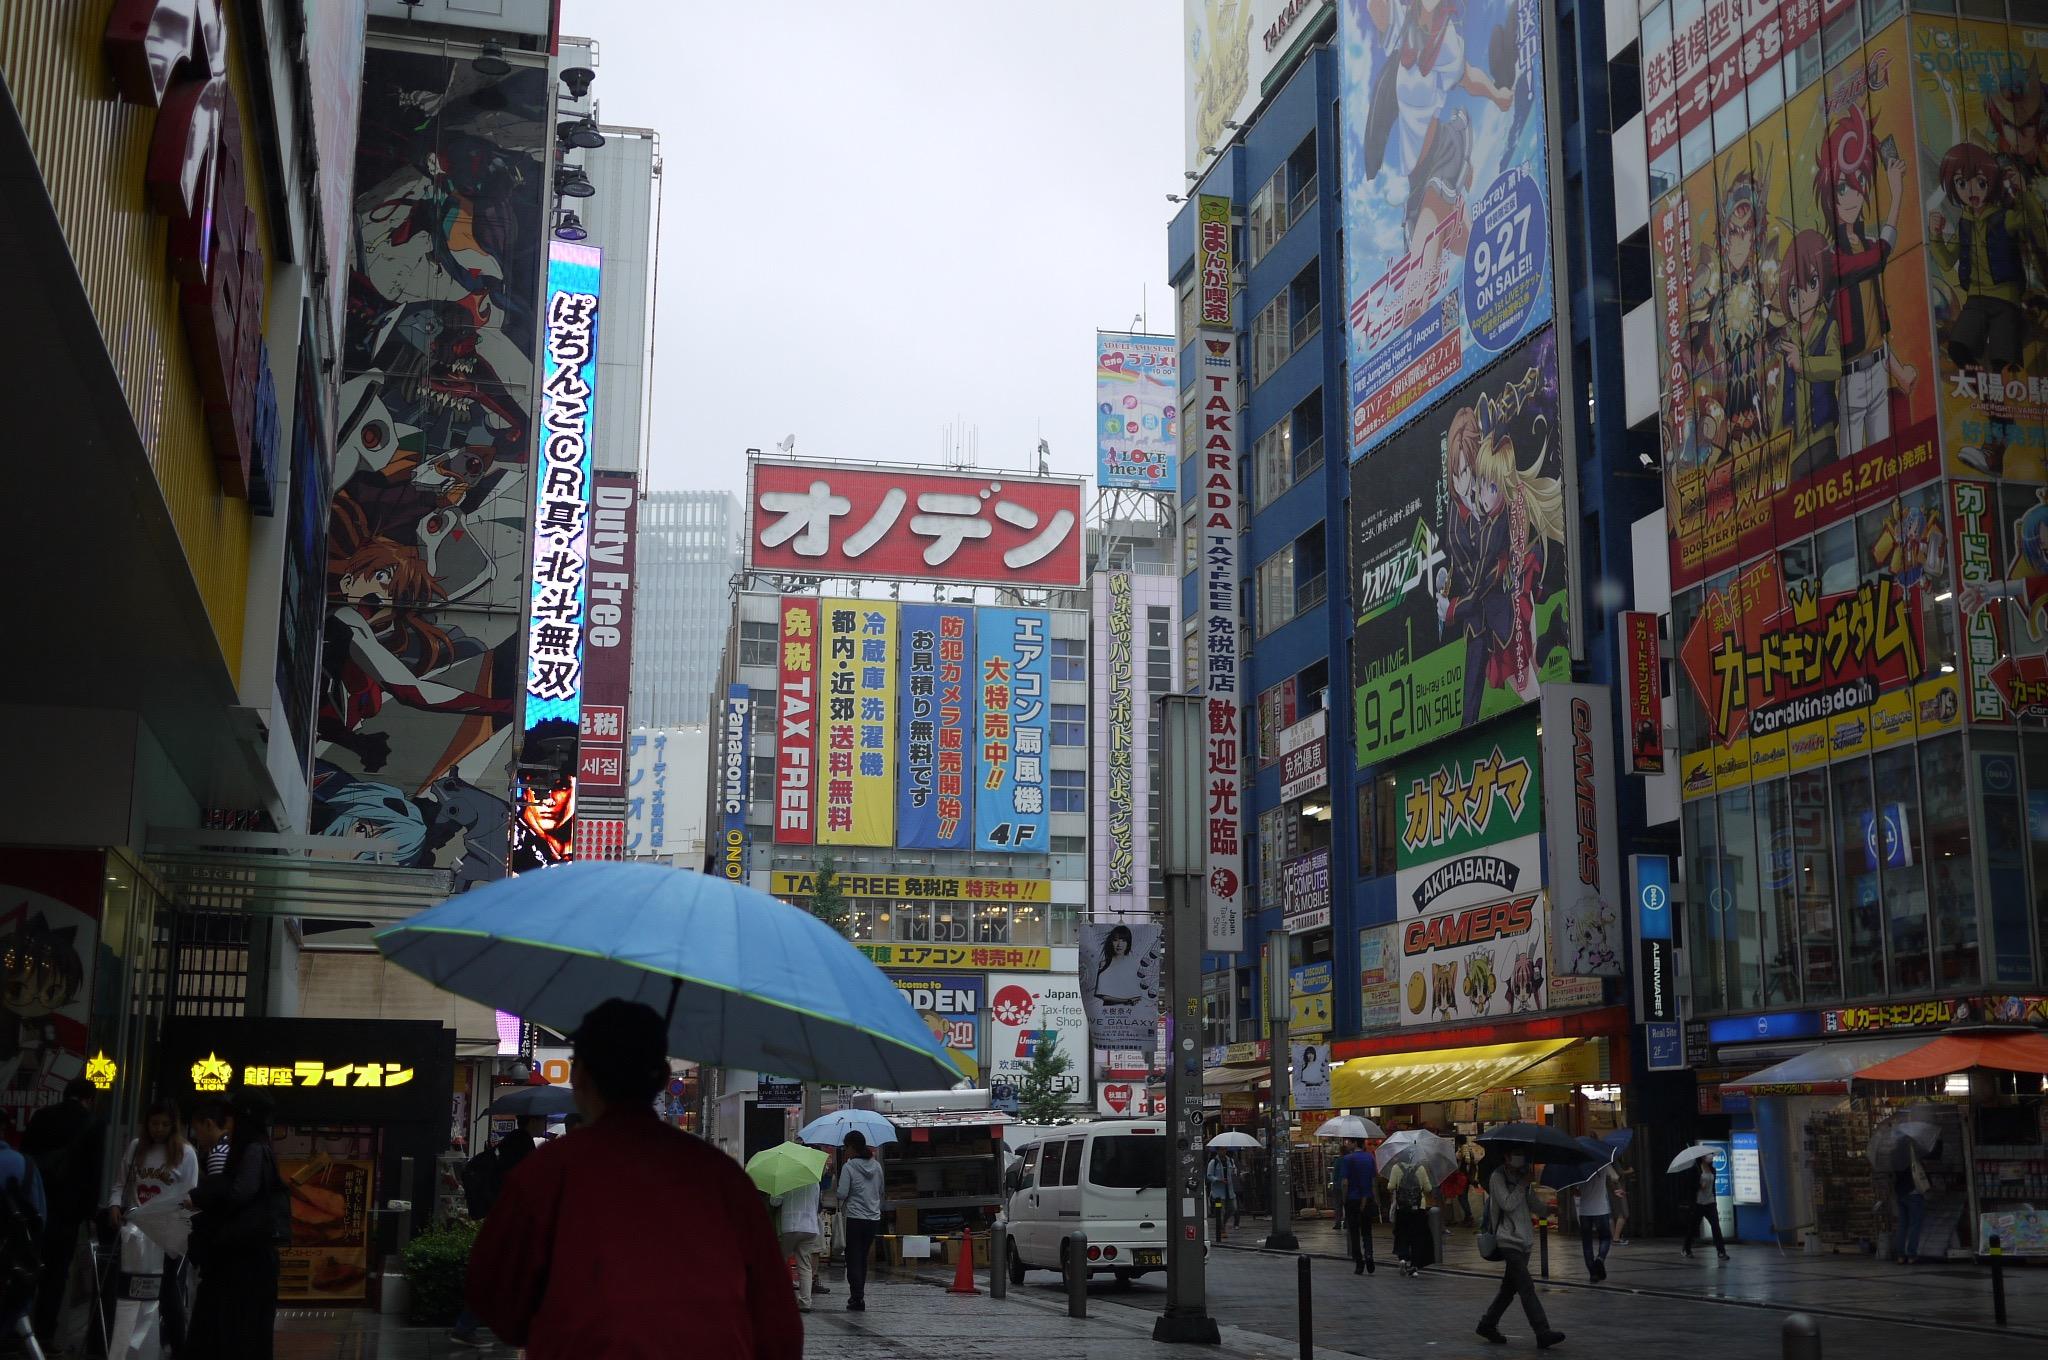 Chiyoda, Tokyo, Anime Heaven of the World